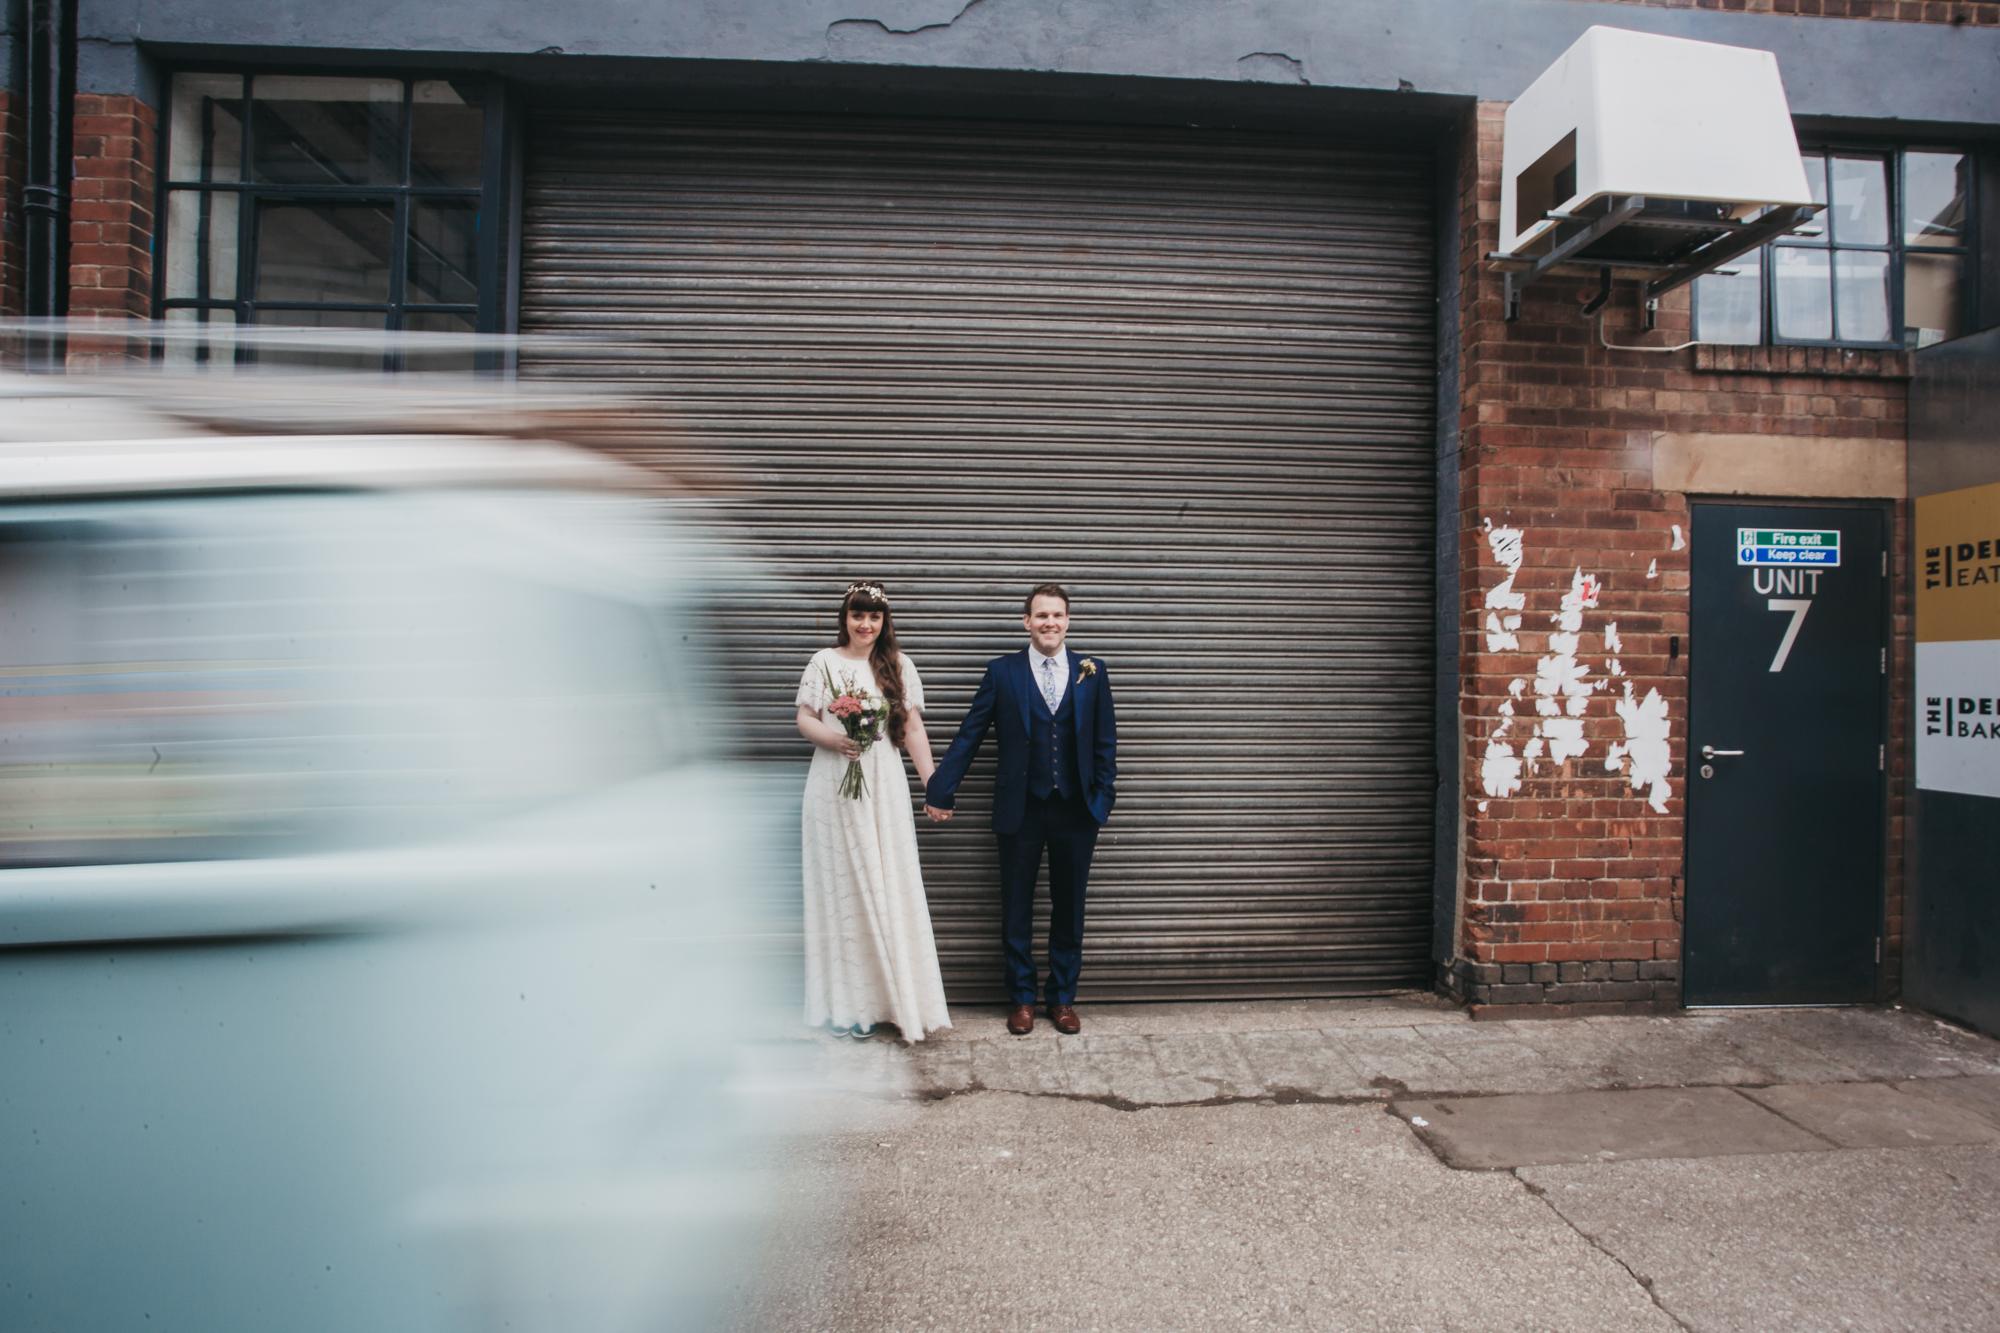 Kristy-Back-Garden-Outdoor-Wedding-Sheffield-Industrial-Warehouse-Wedding-Bohemian-Kate-Beaumont-Dahlia-Dress-36.jpg